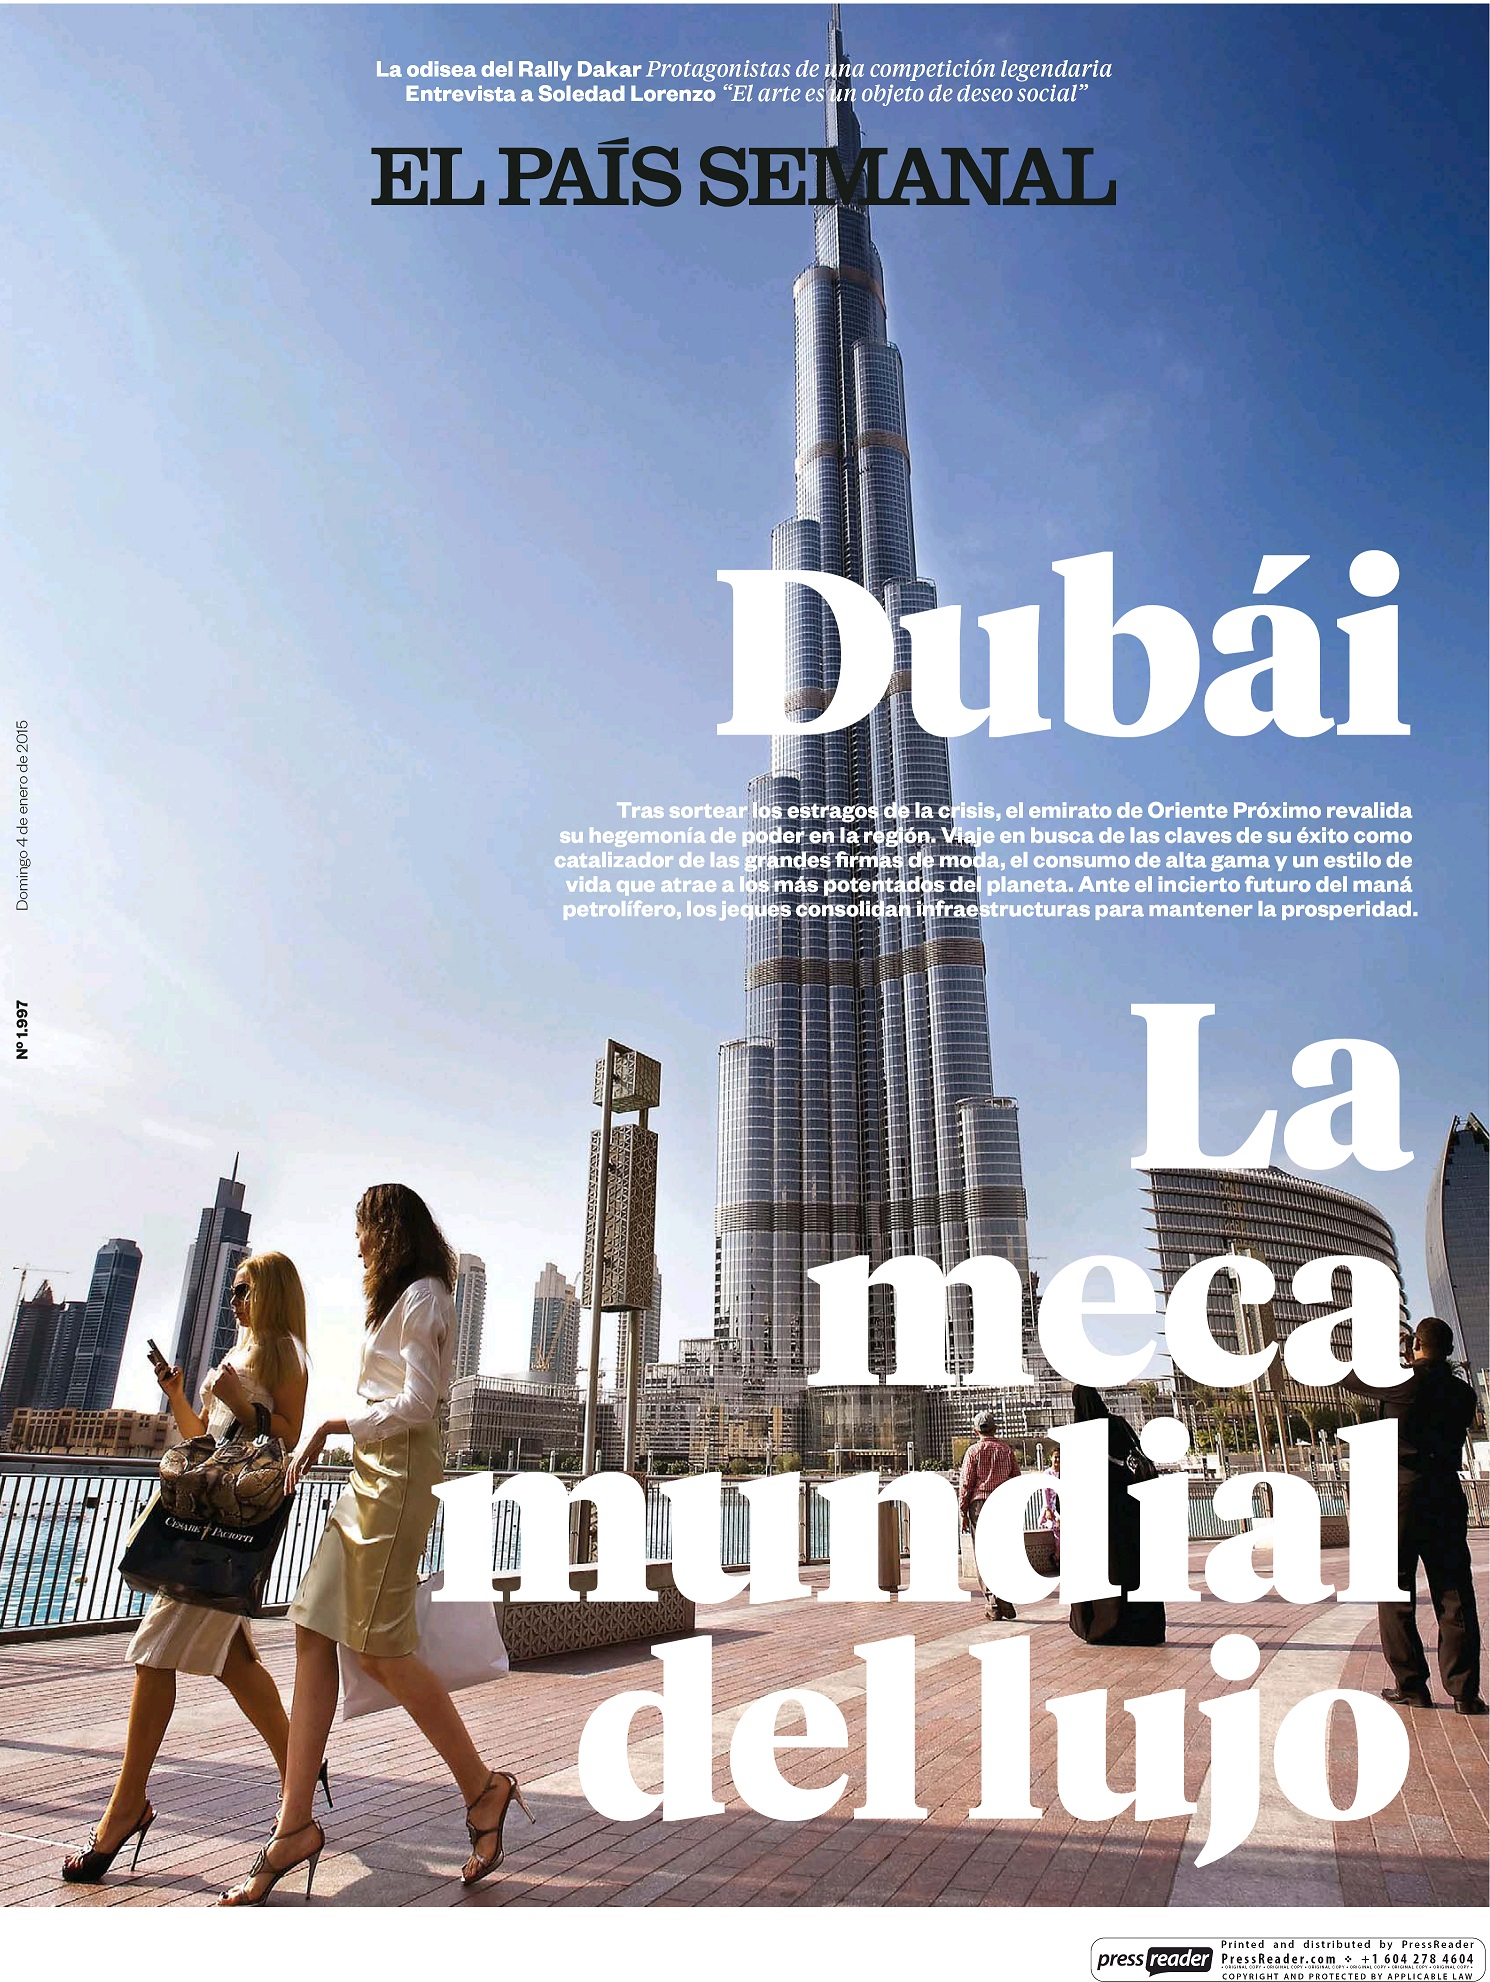 PAIS SEMANAL portada 4 de Enero 2015